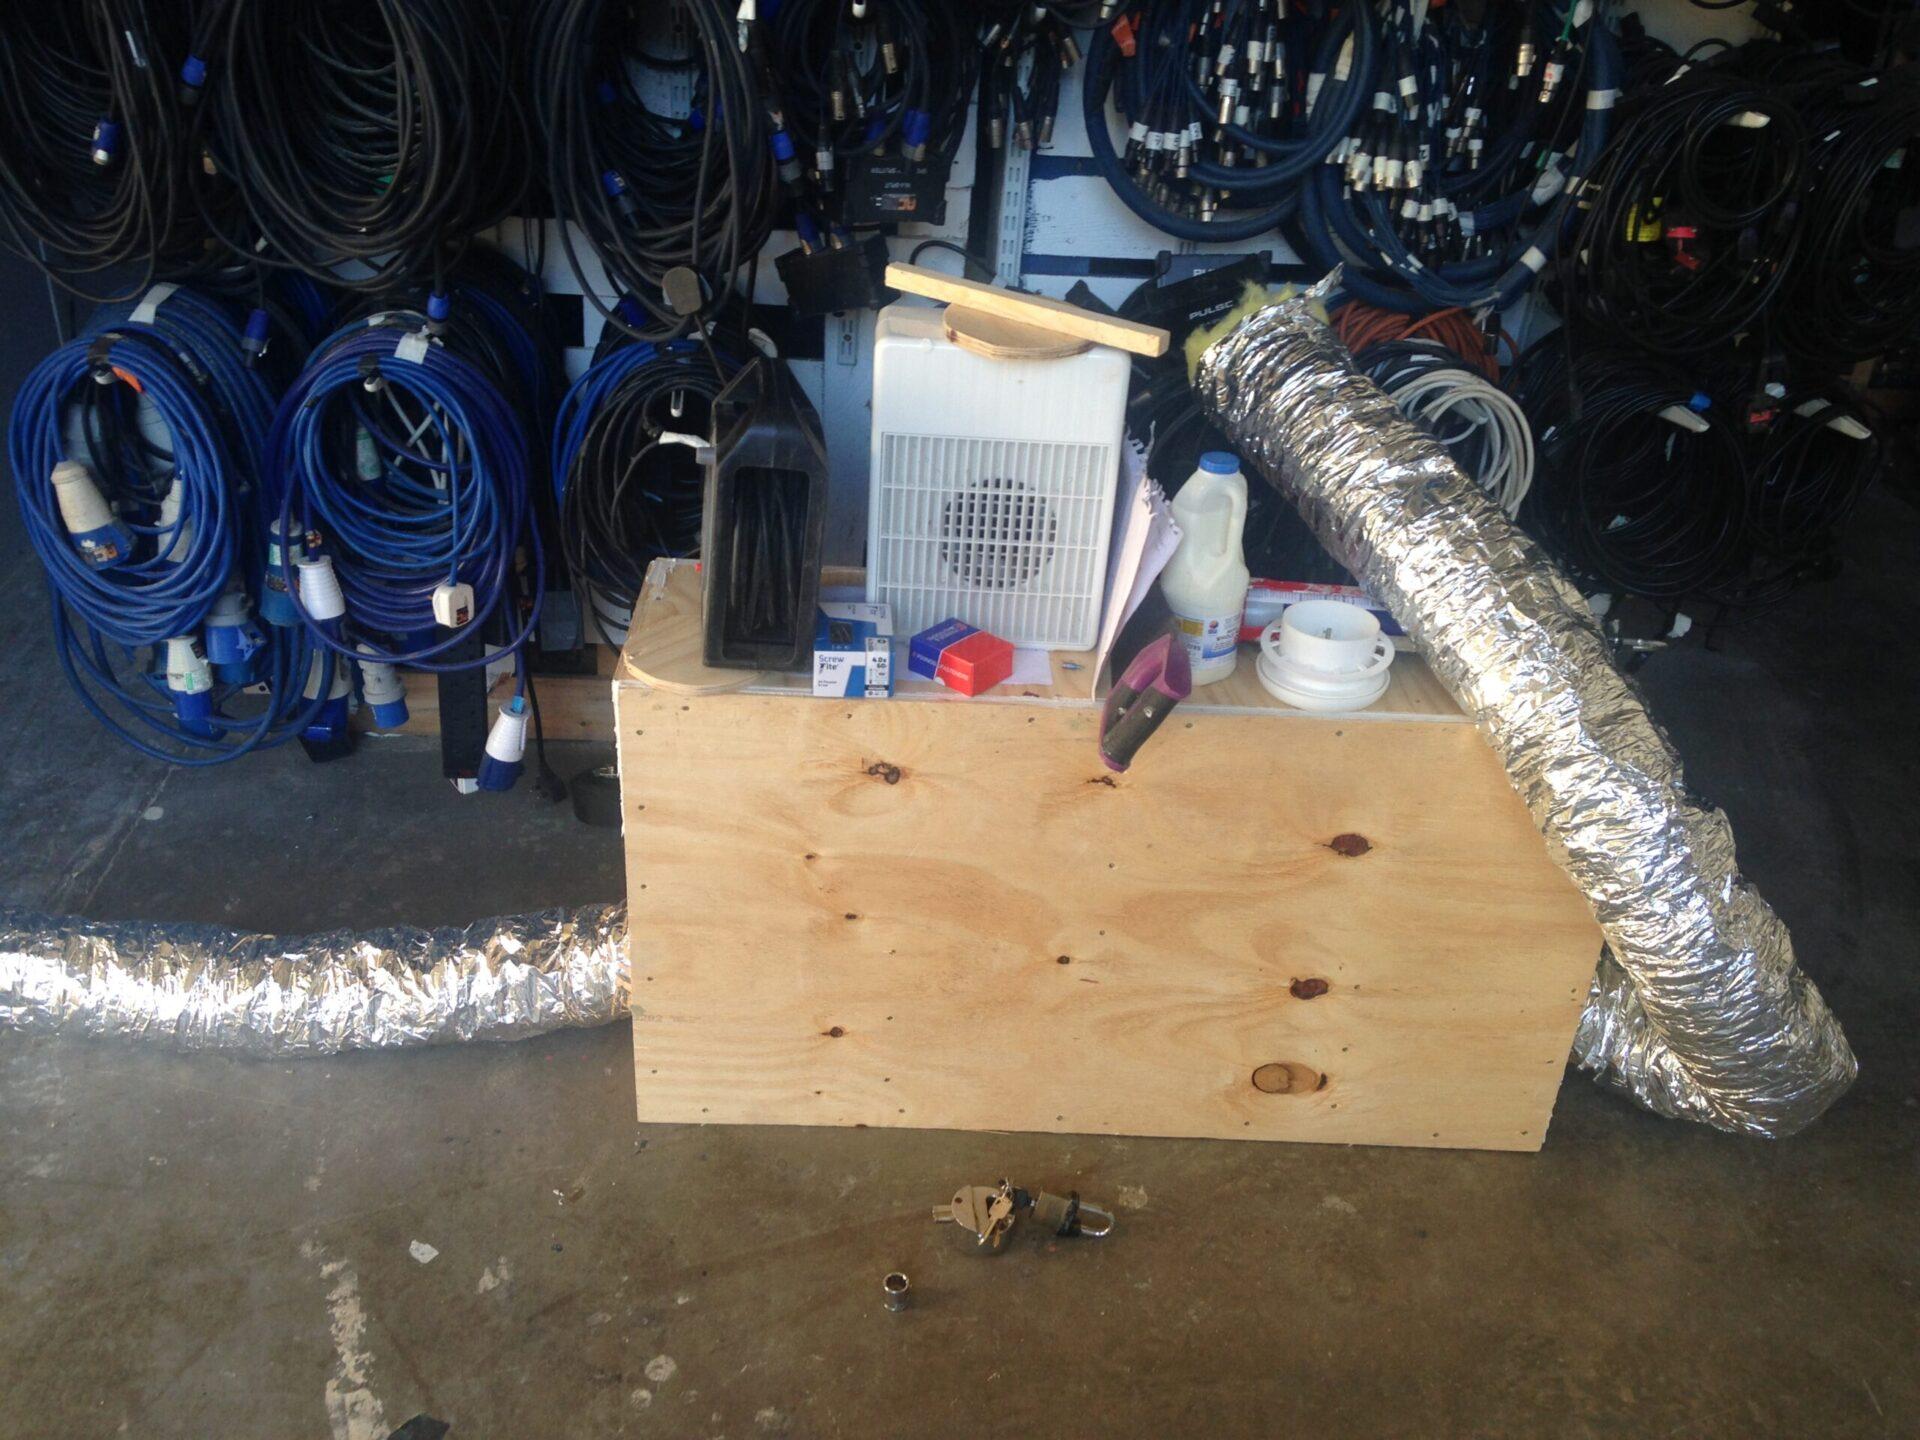 Soundproof ventilation